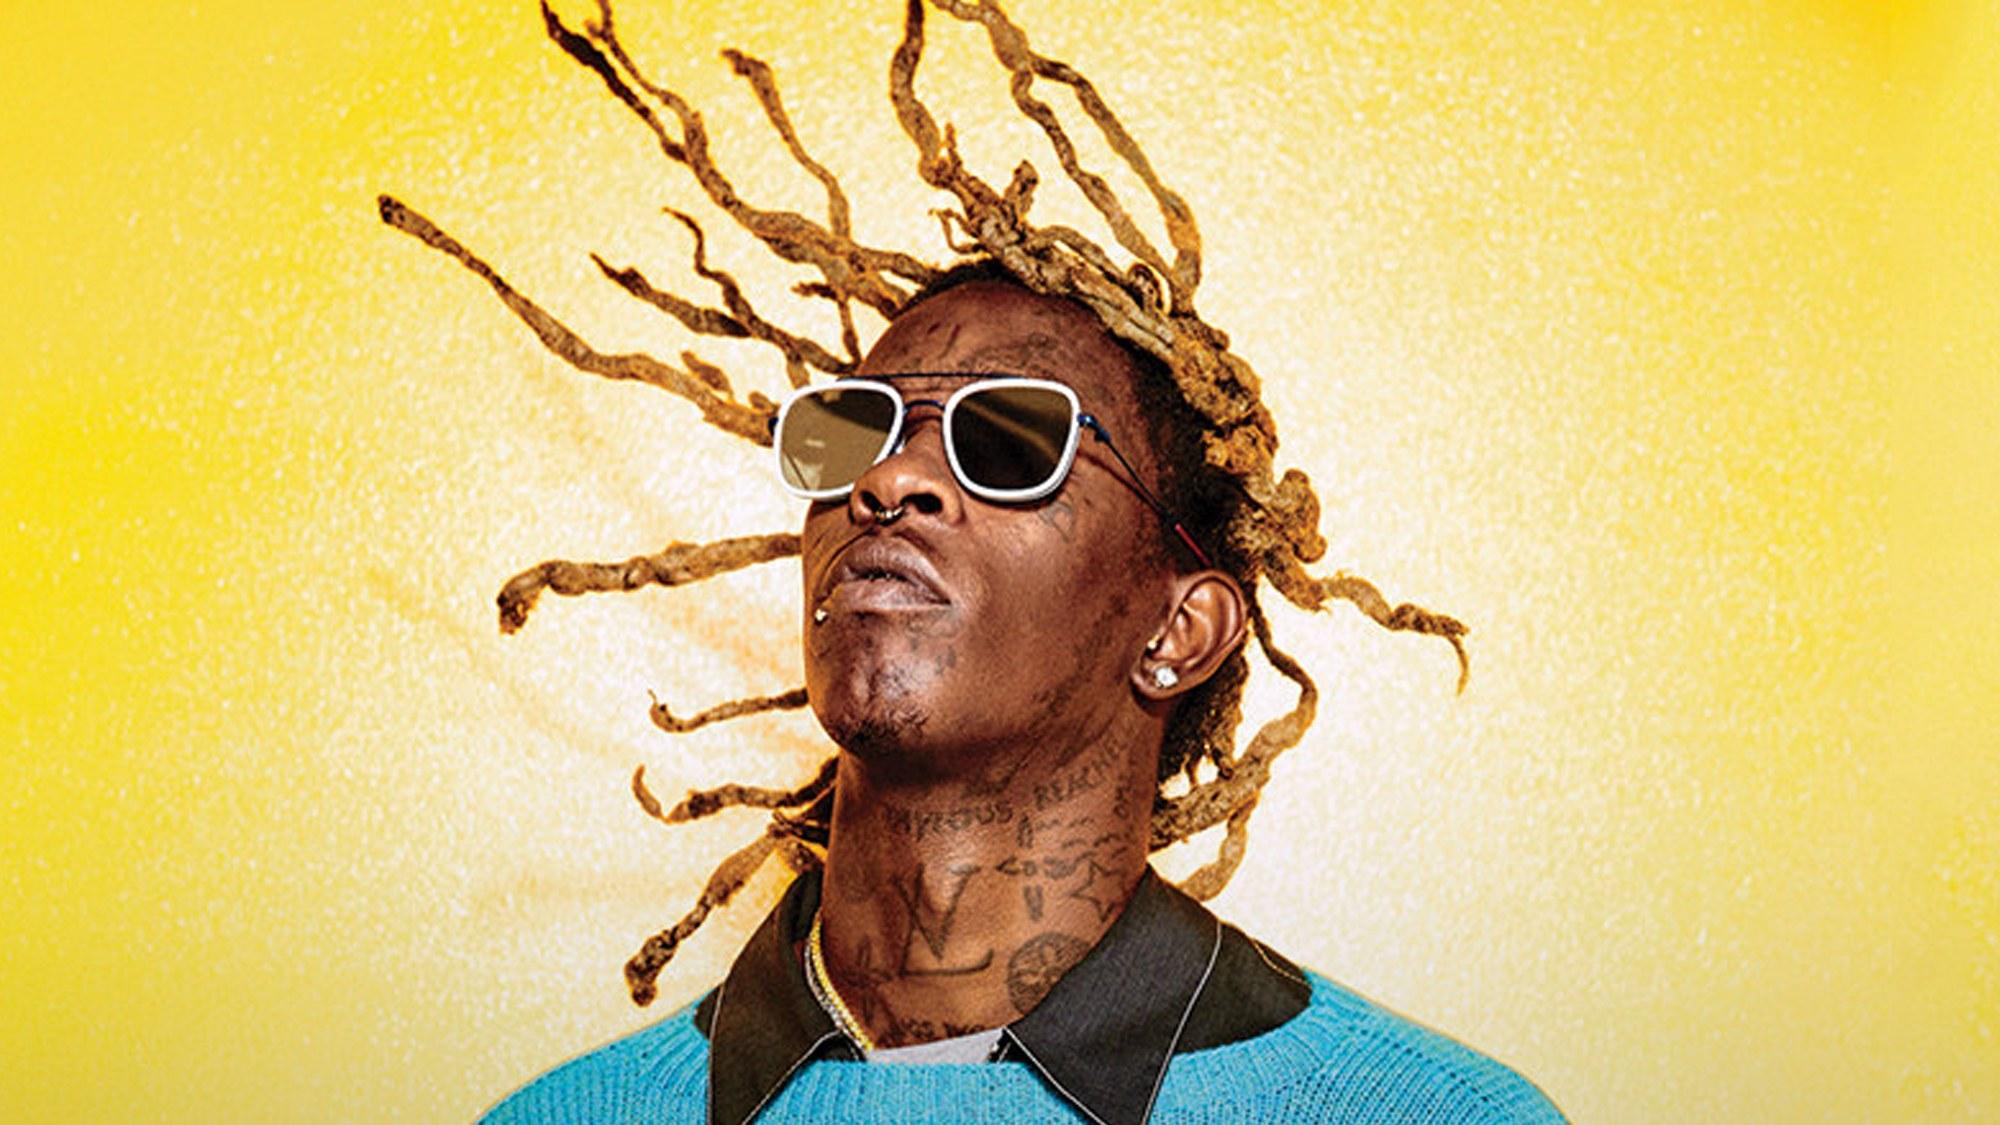 SOS Fest Artist Spotlight: Young Thug